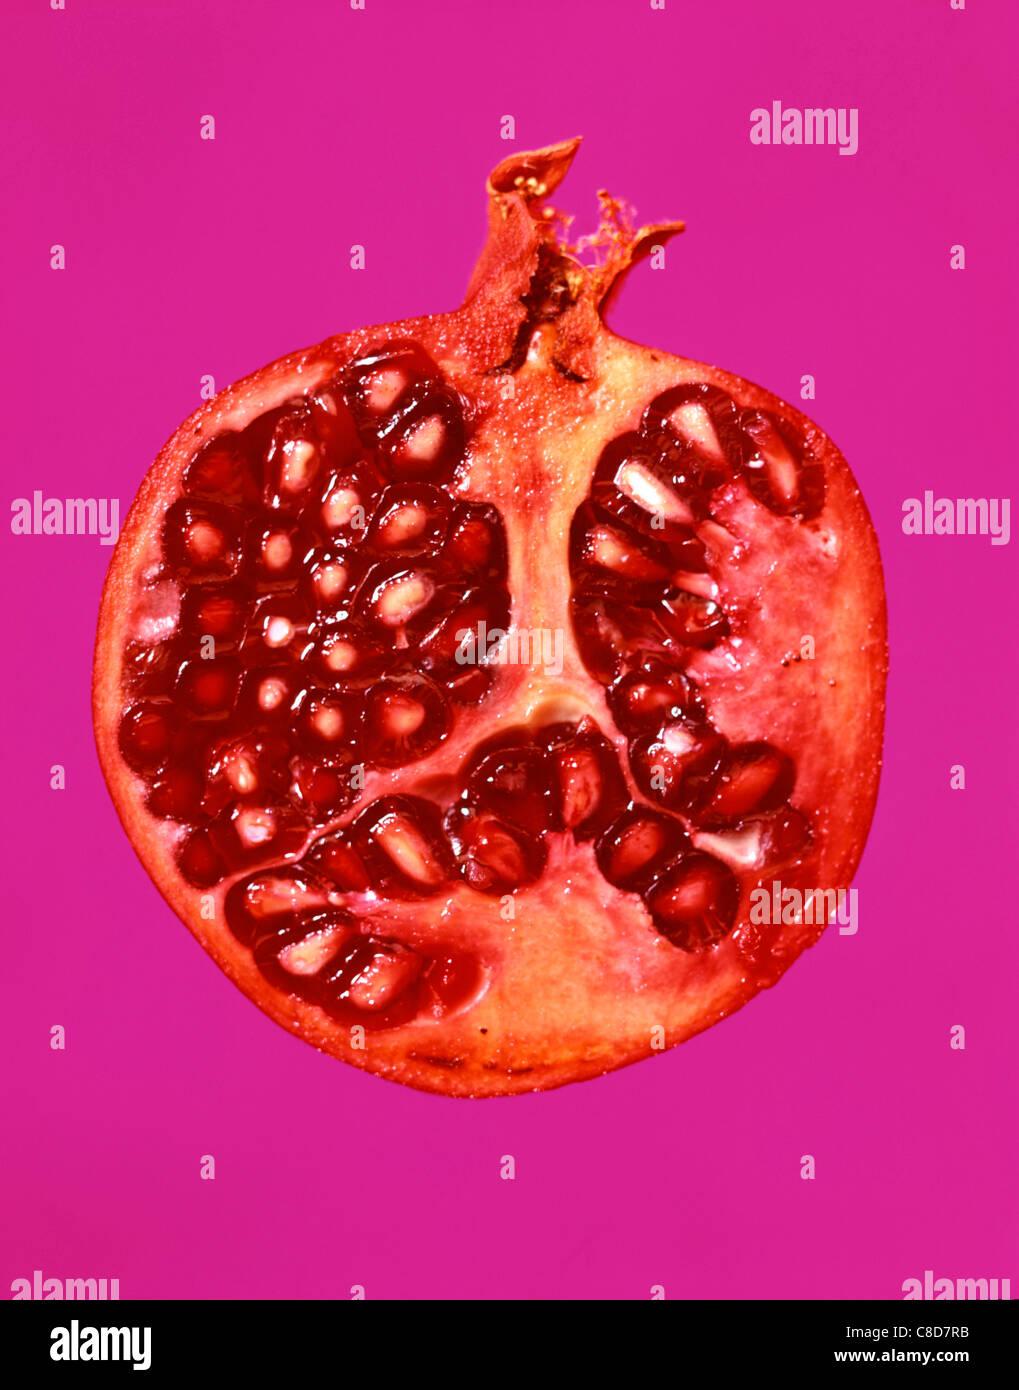 Sliced pomegrante - Stock Image